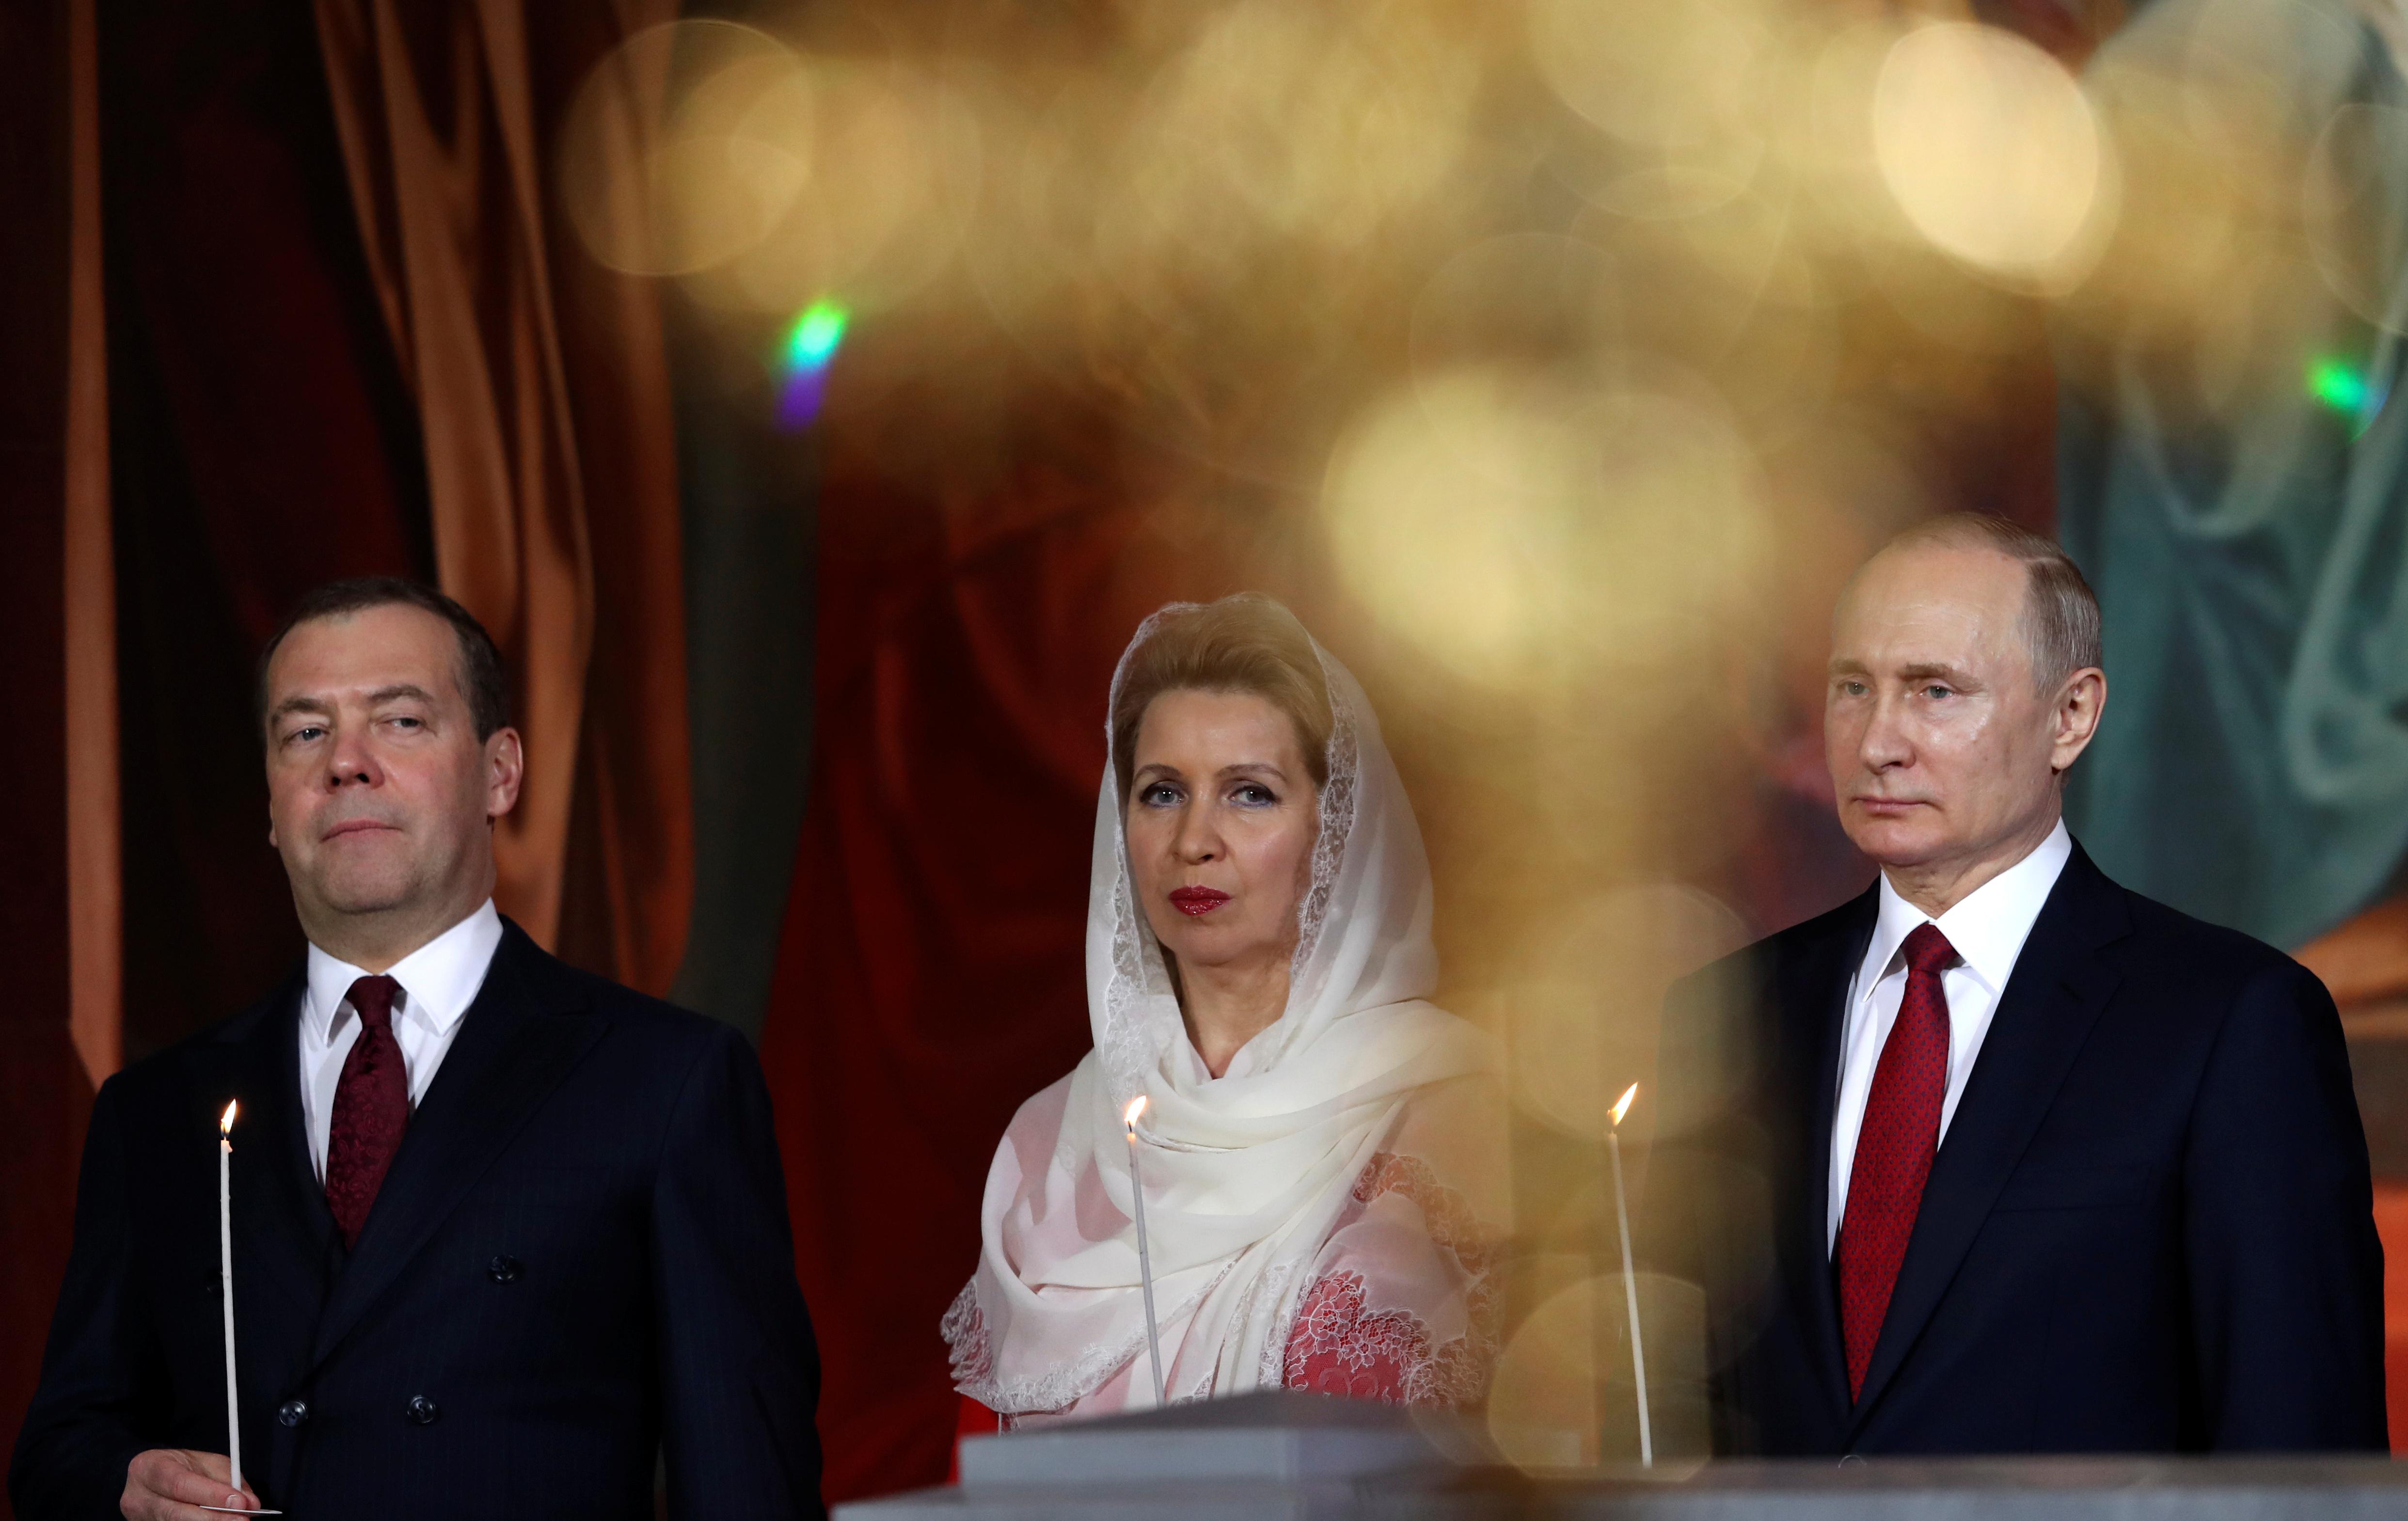 2019-04-27T211123Z_1403591286_RC112E017090_RTRMADP_3_RELIGION-EASTER-RUSSIA